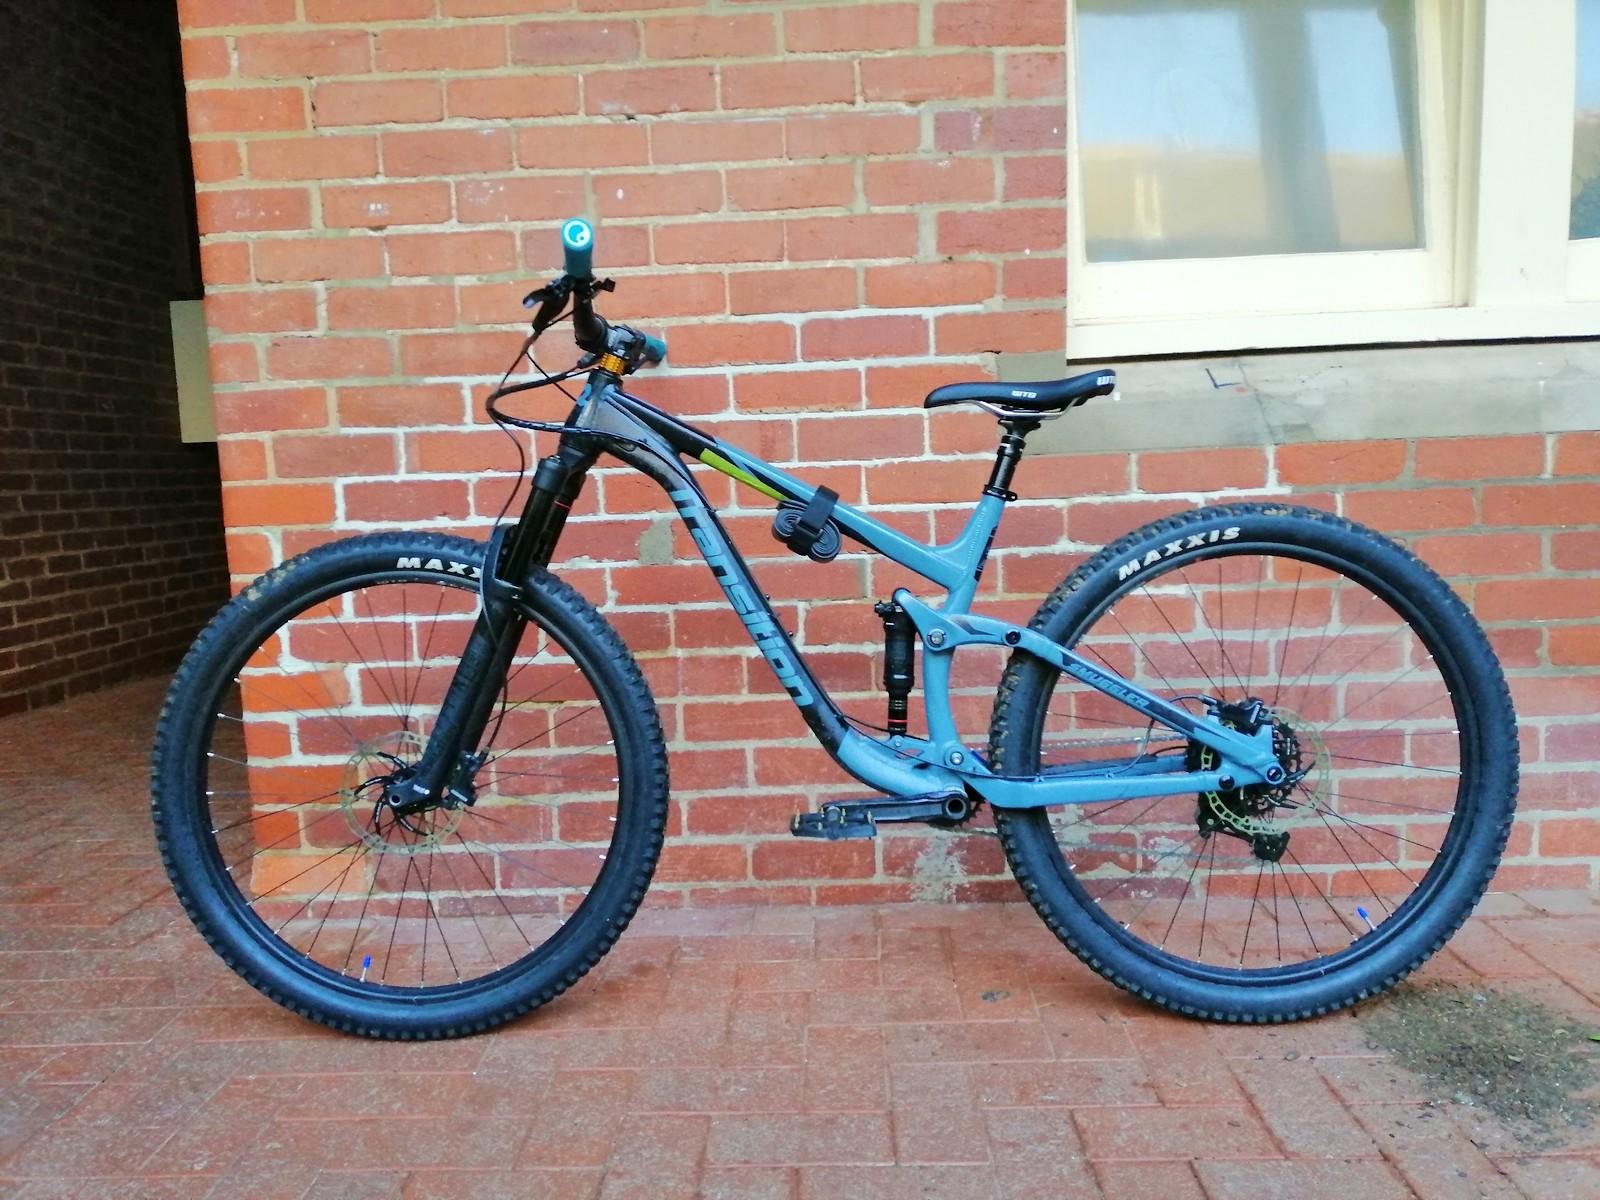 IMG 20190623 162506 - Johnboy - Mountain Biking Pictures - Vital MTB